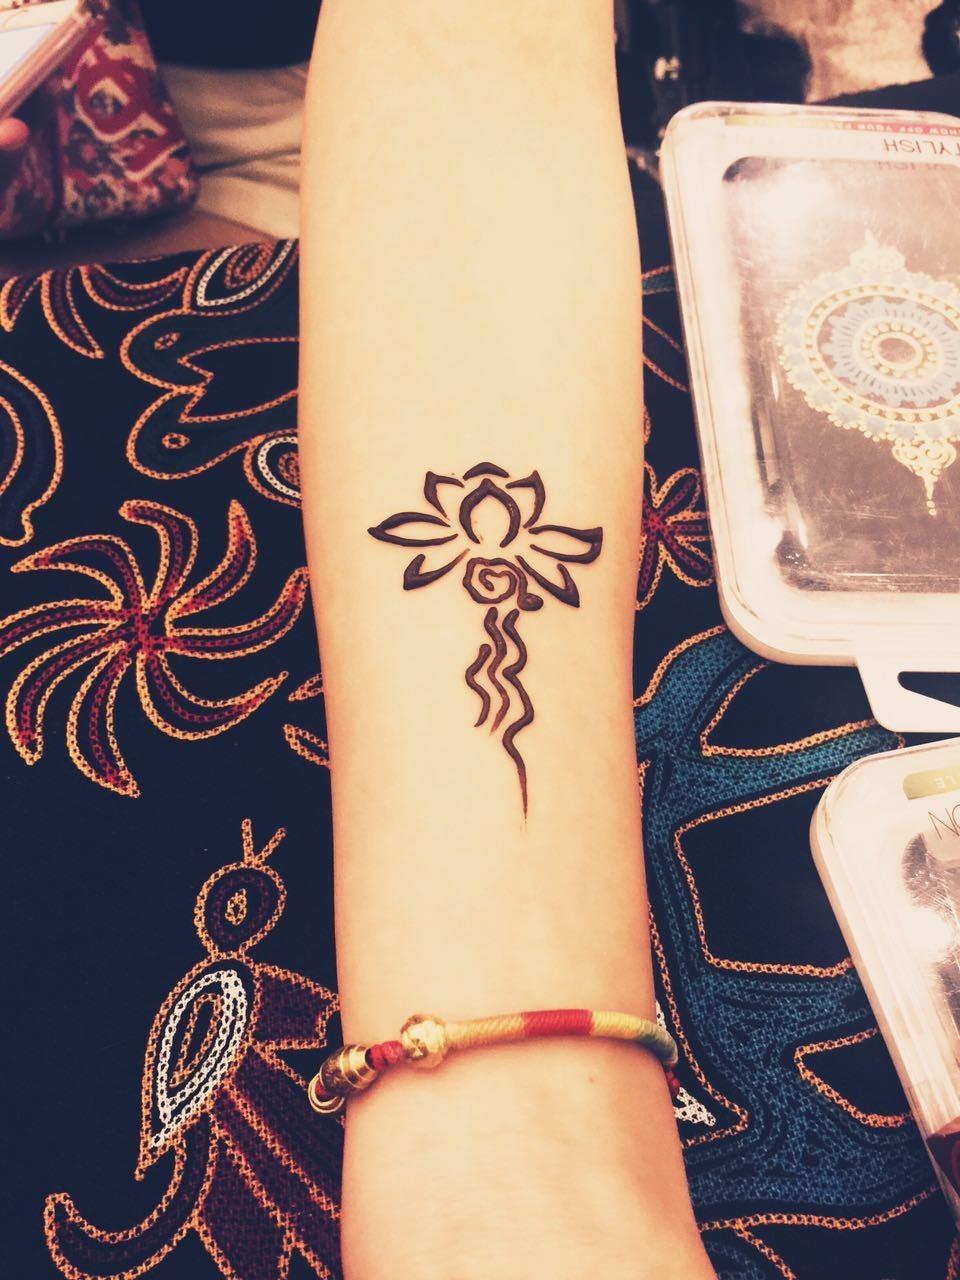 snake&henna印度海娜手绘纹身,坚持采用进口纯植物染膏,纯